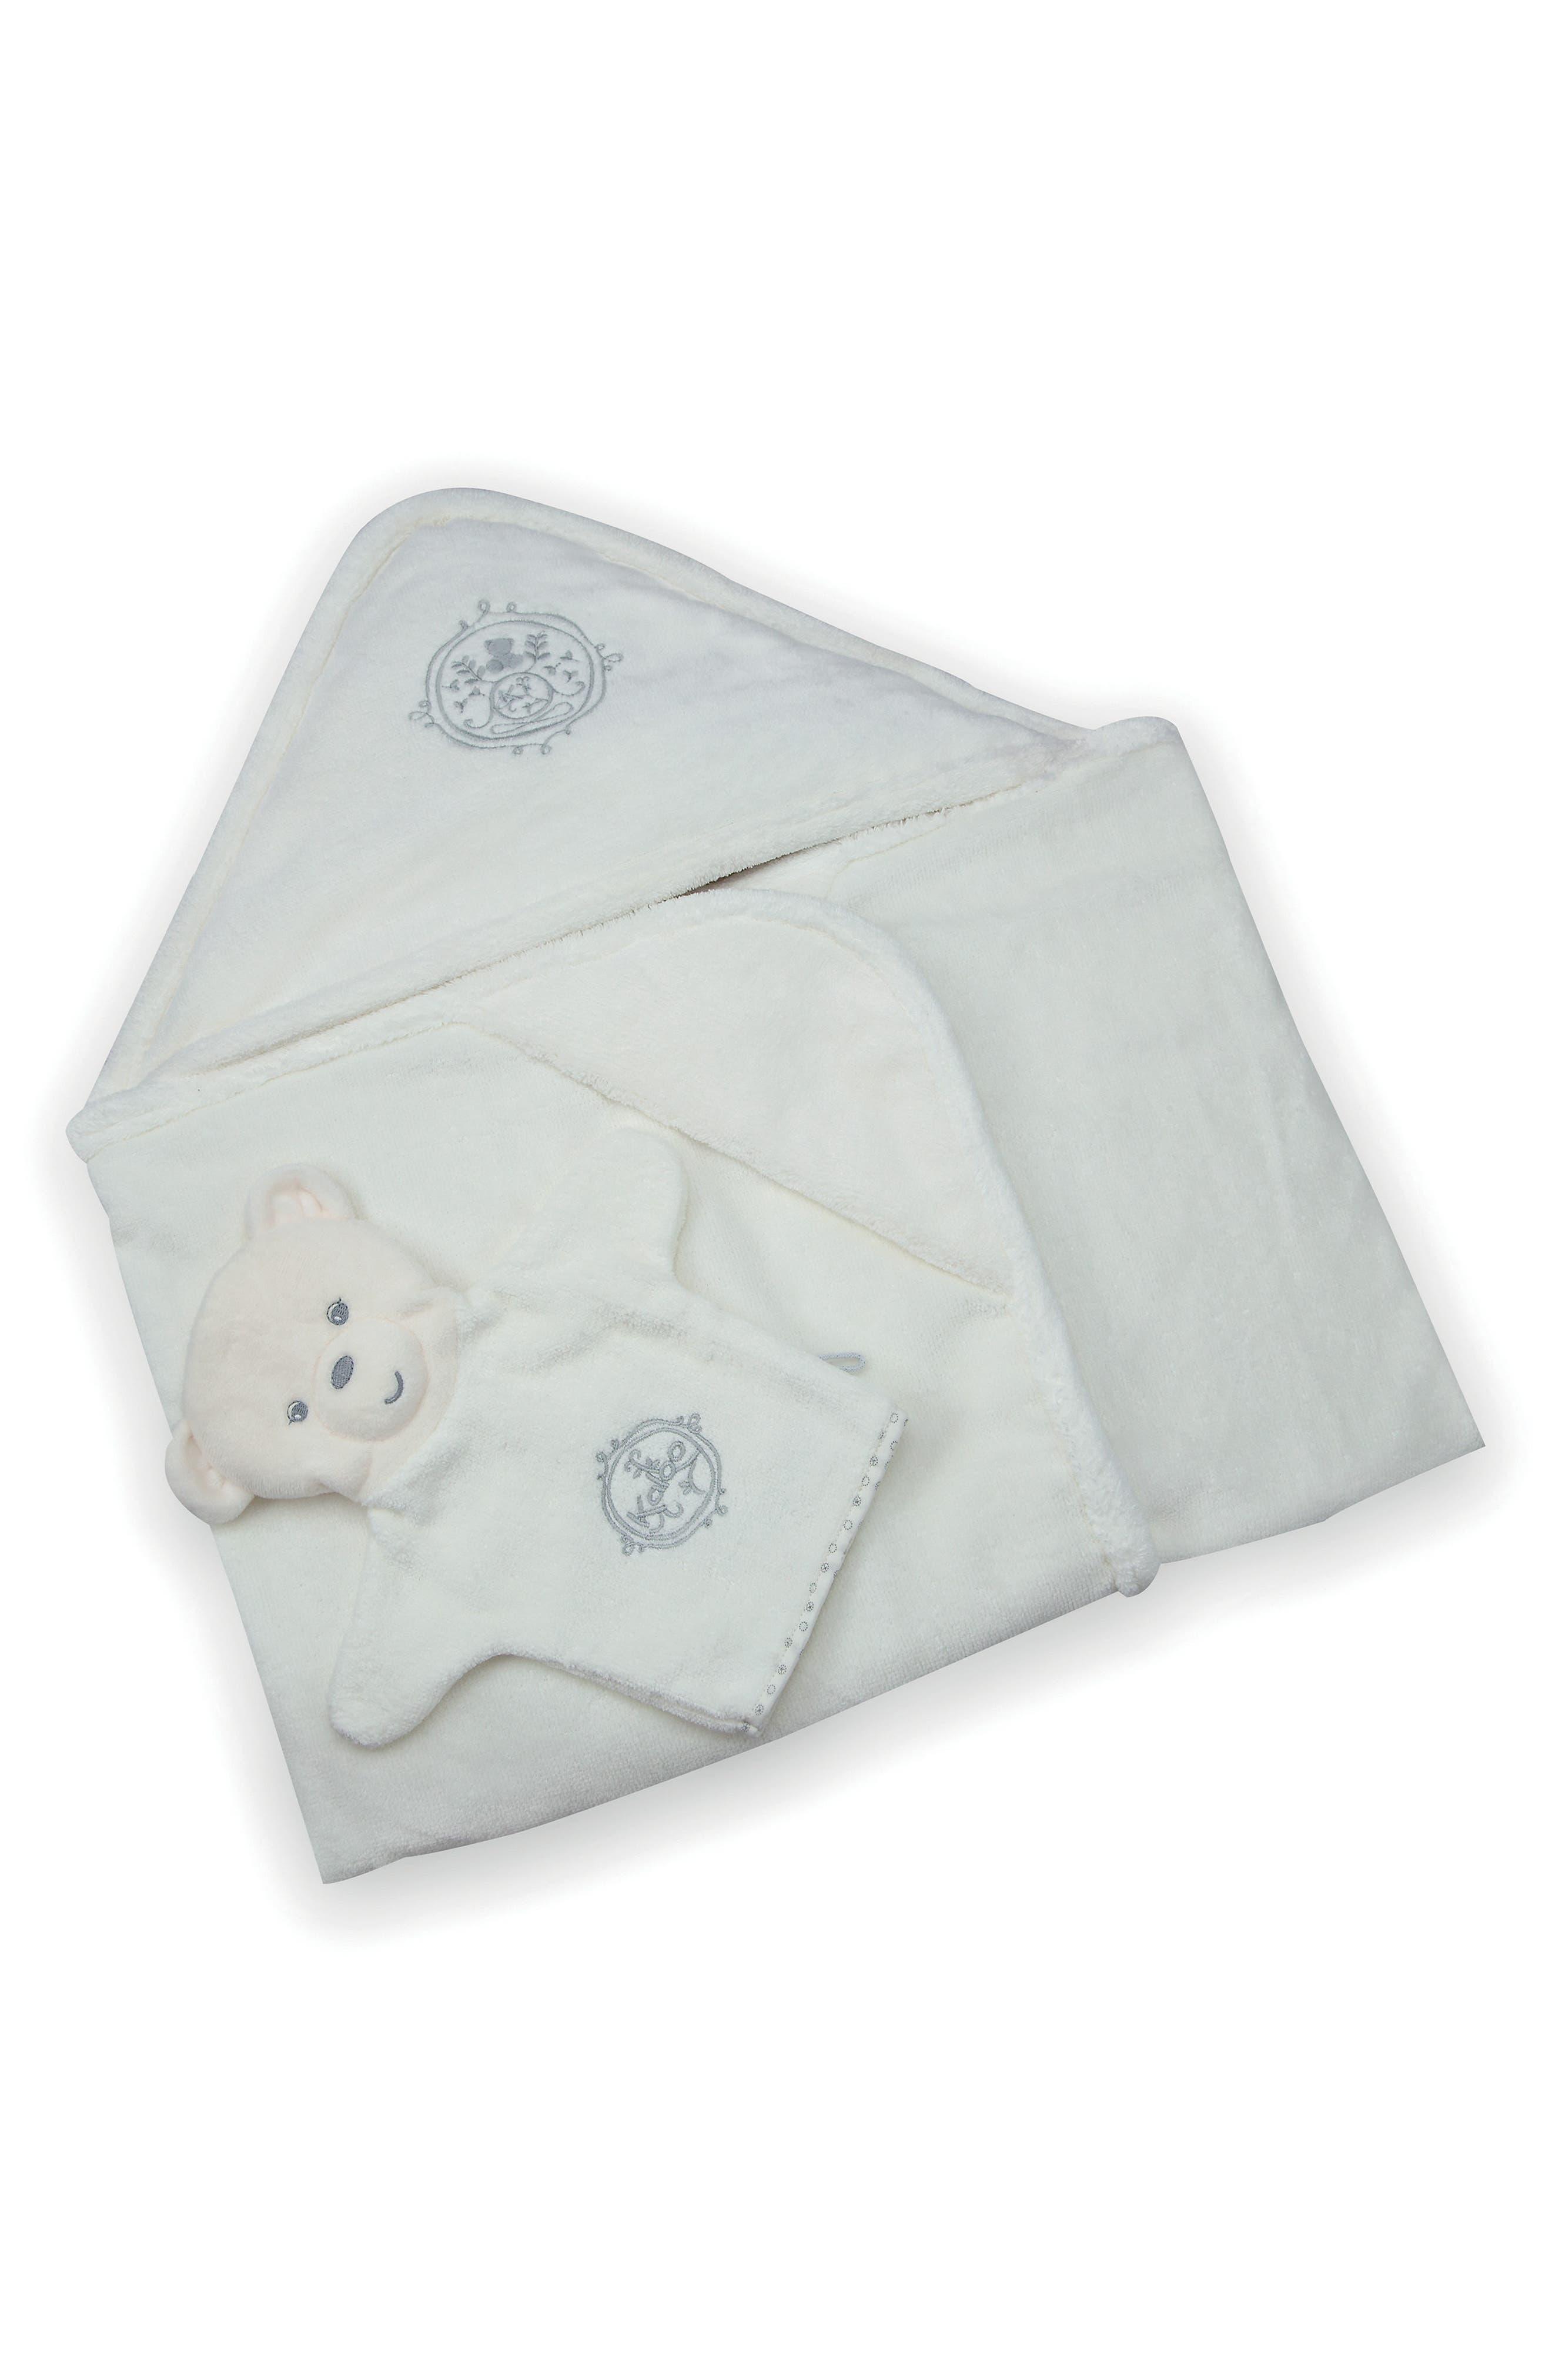 Bath Towel & Bear Puppet Wash Mitt,                             Main thumbnail 1, color,                             BLUE